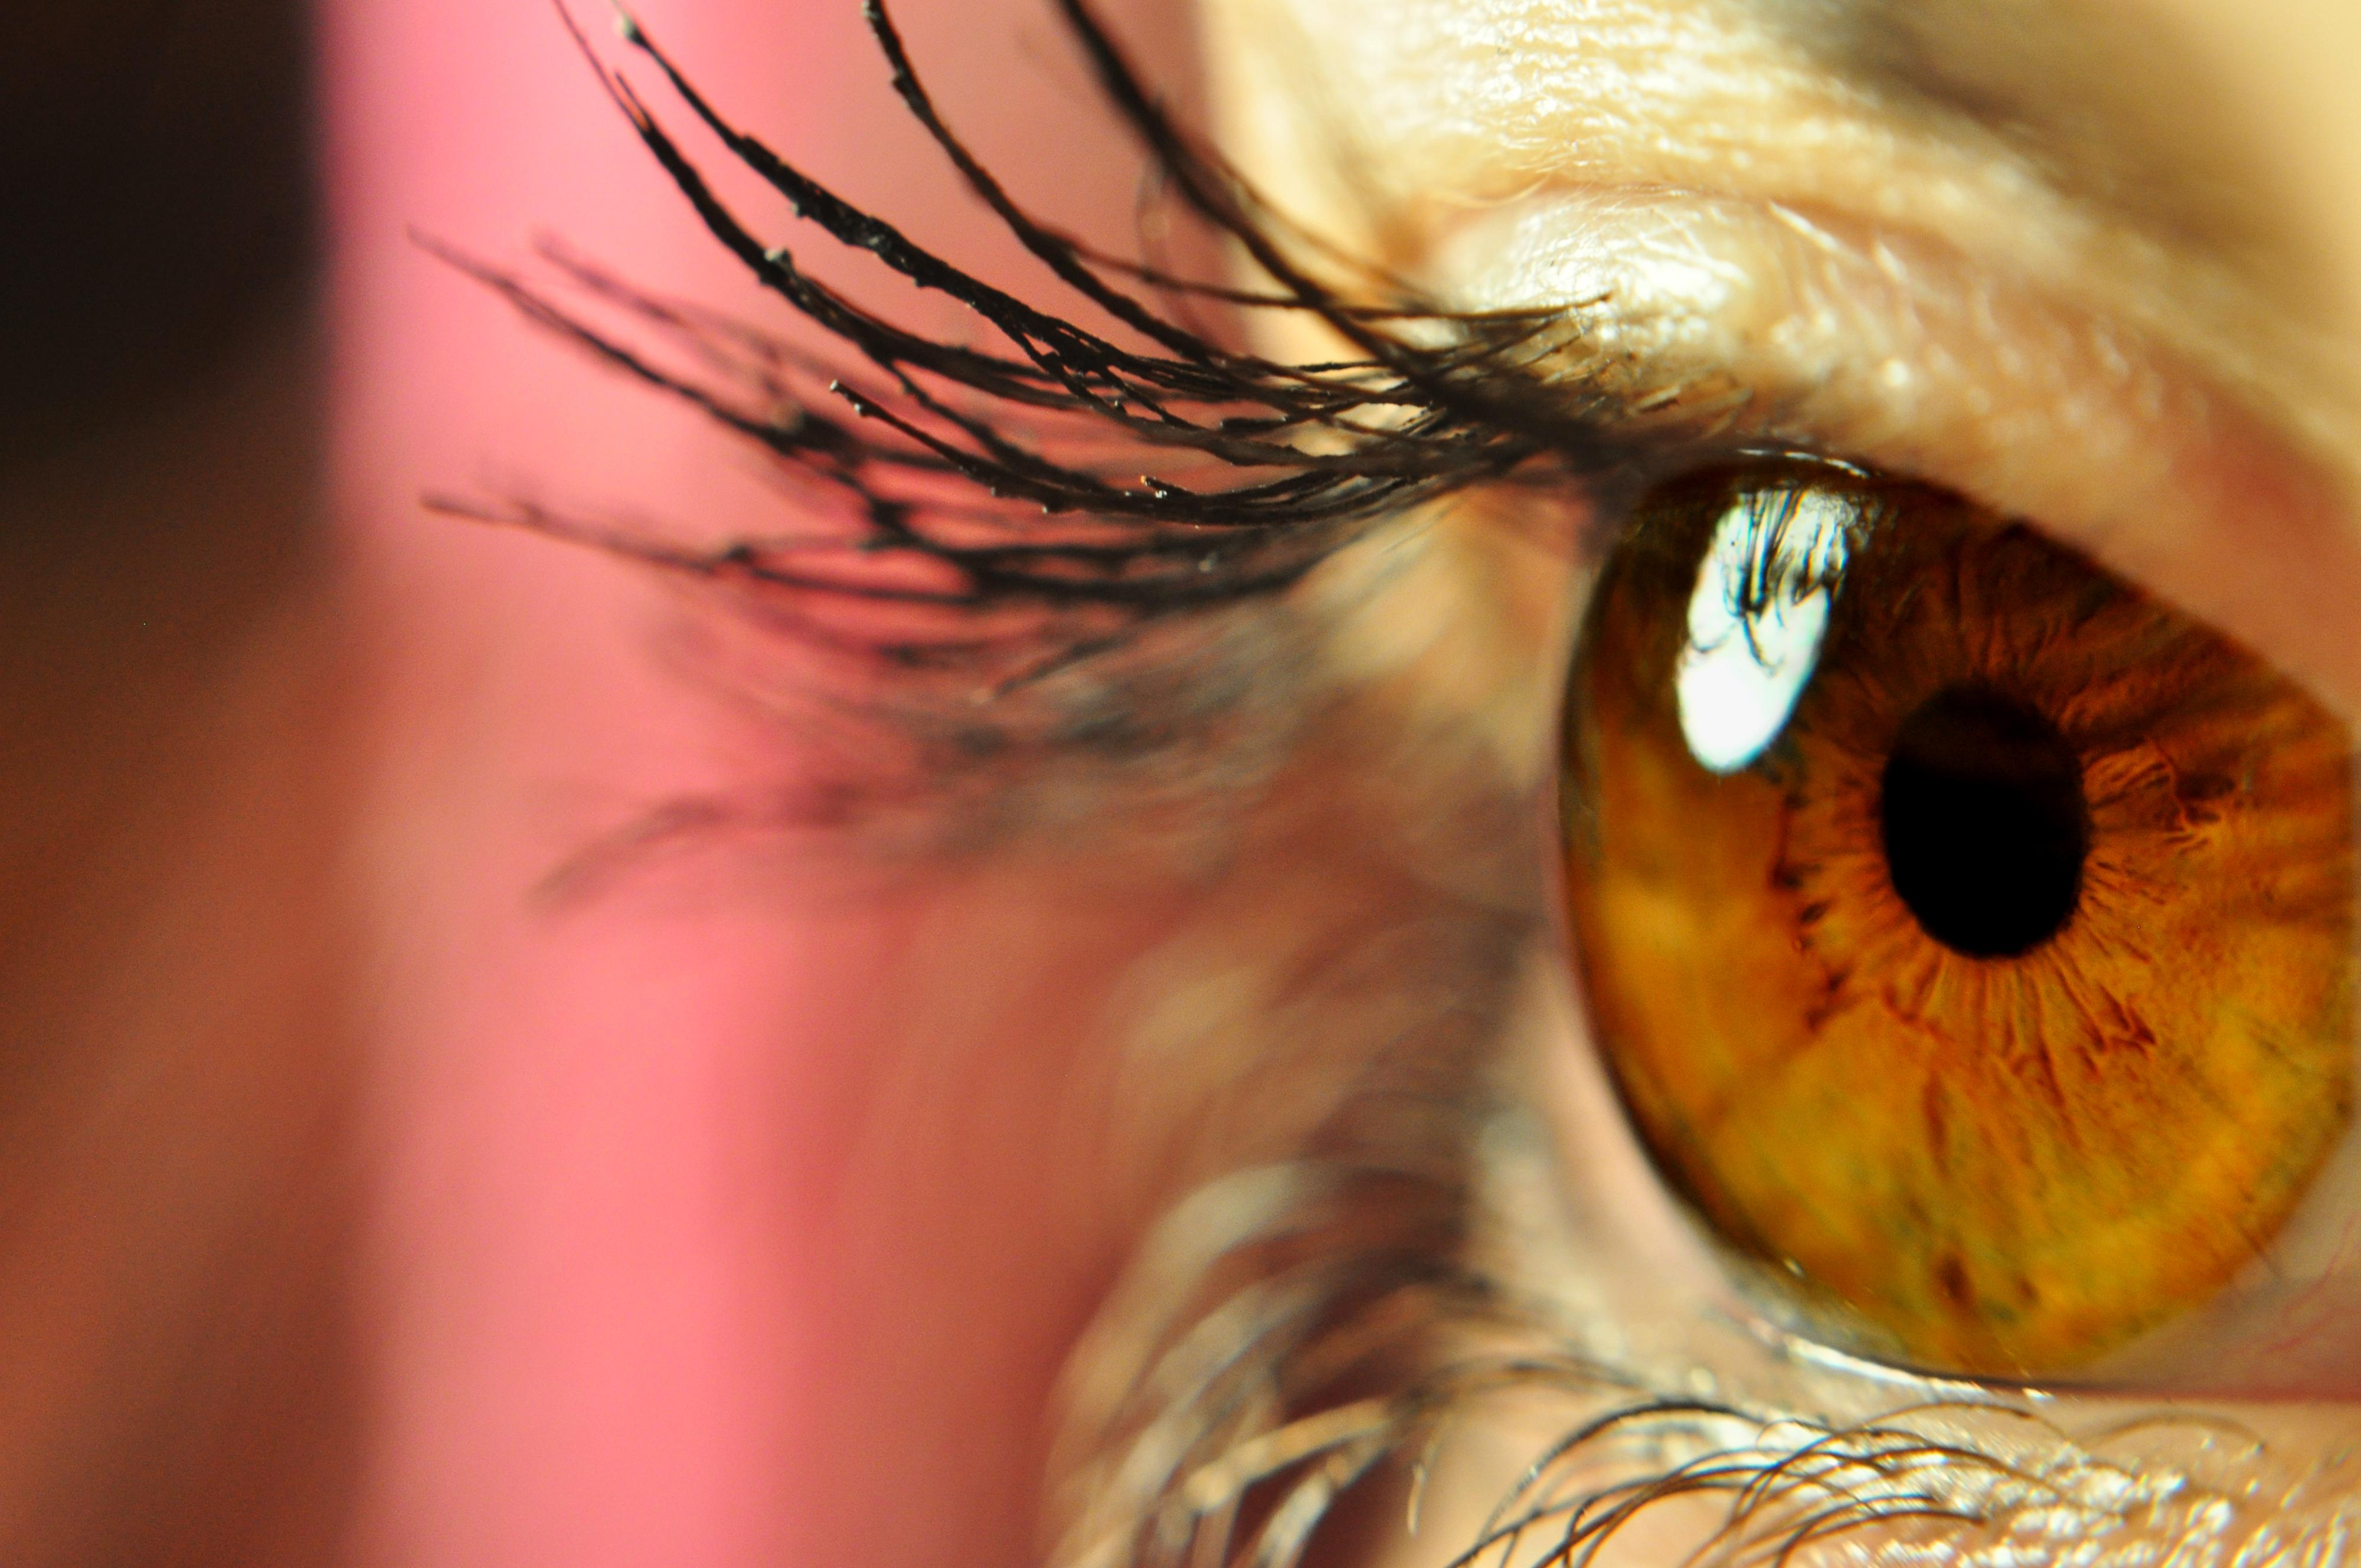 Perfil de ojo marrón